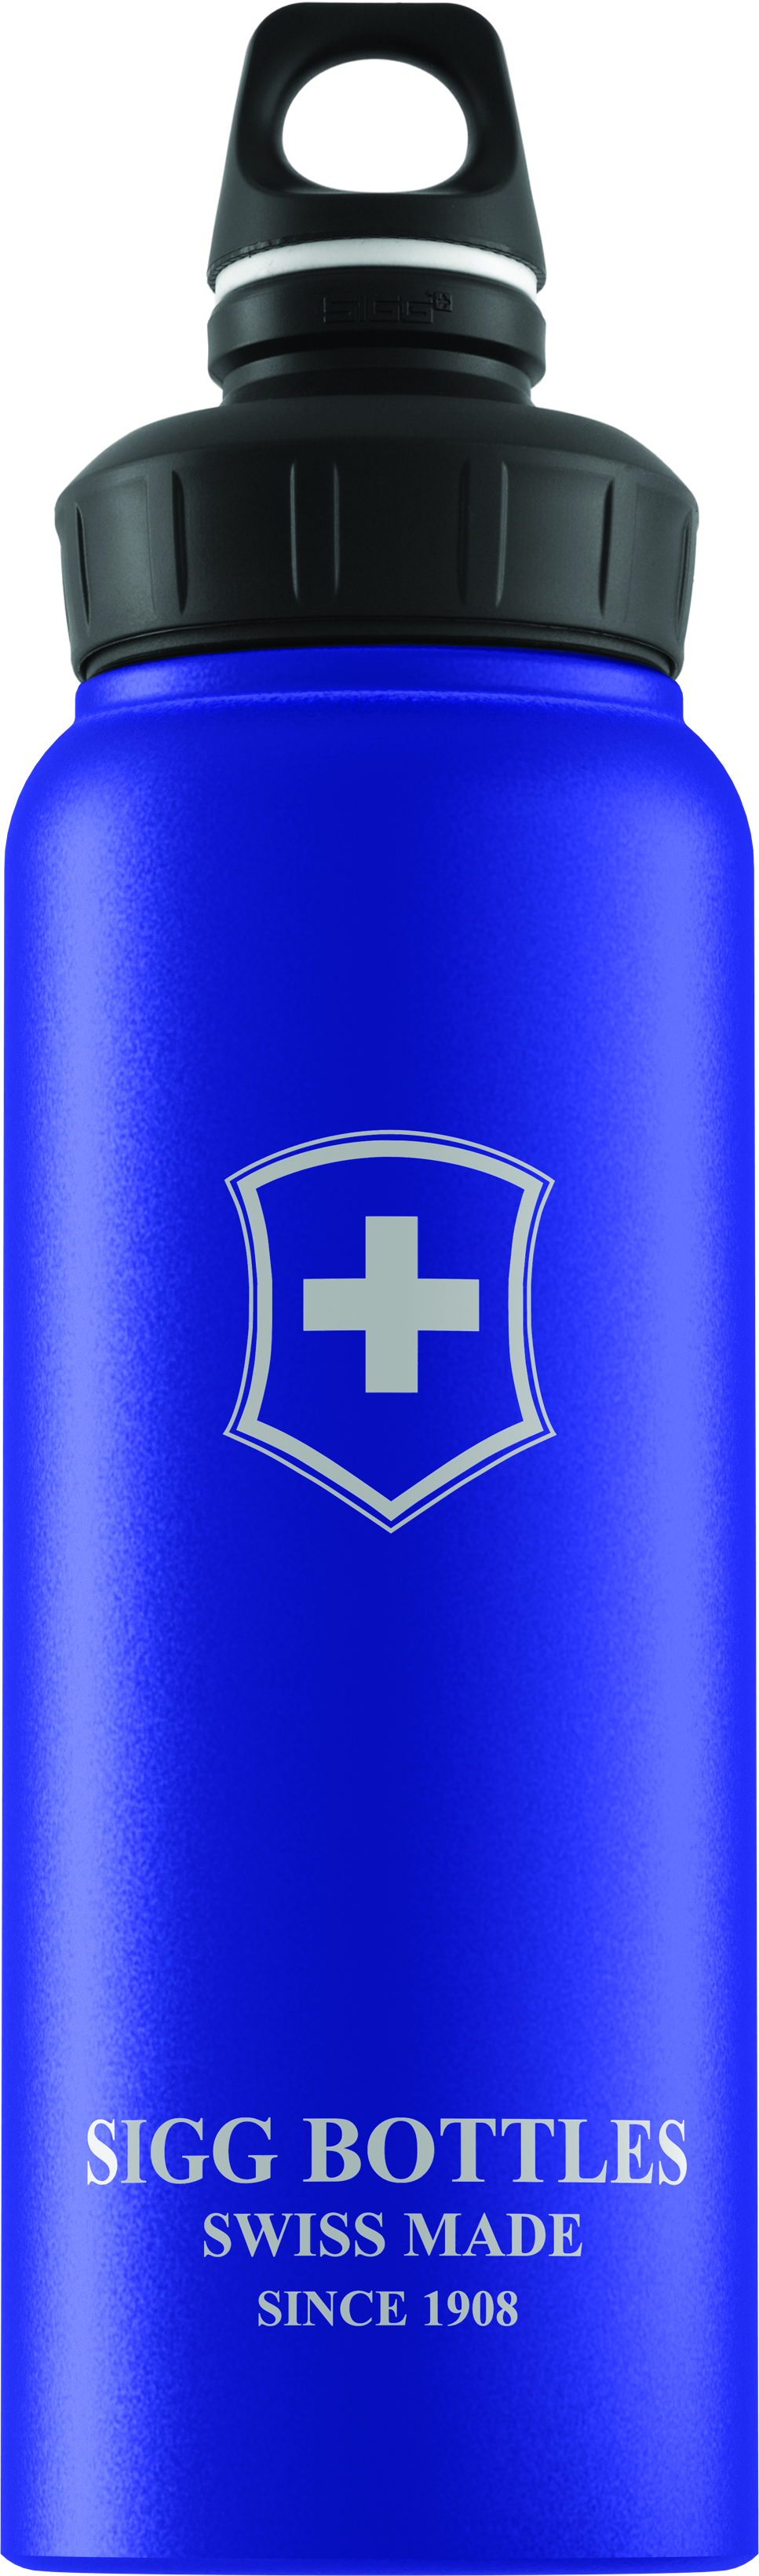 SIGG Swiss Emblem 1000 ml